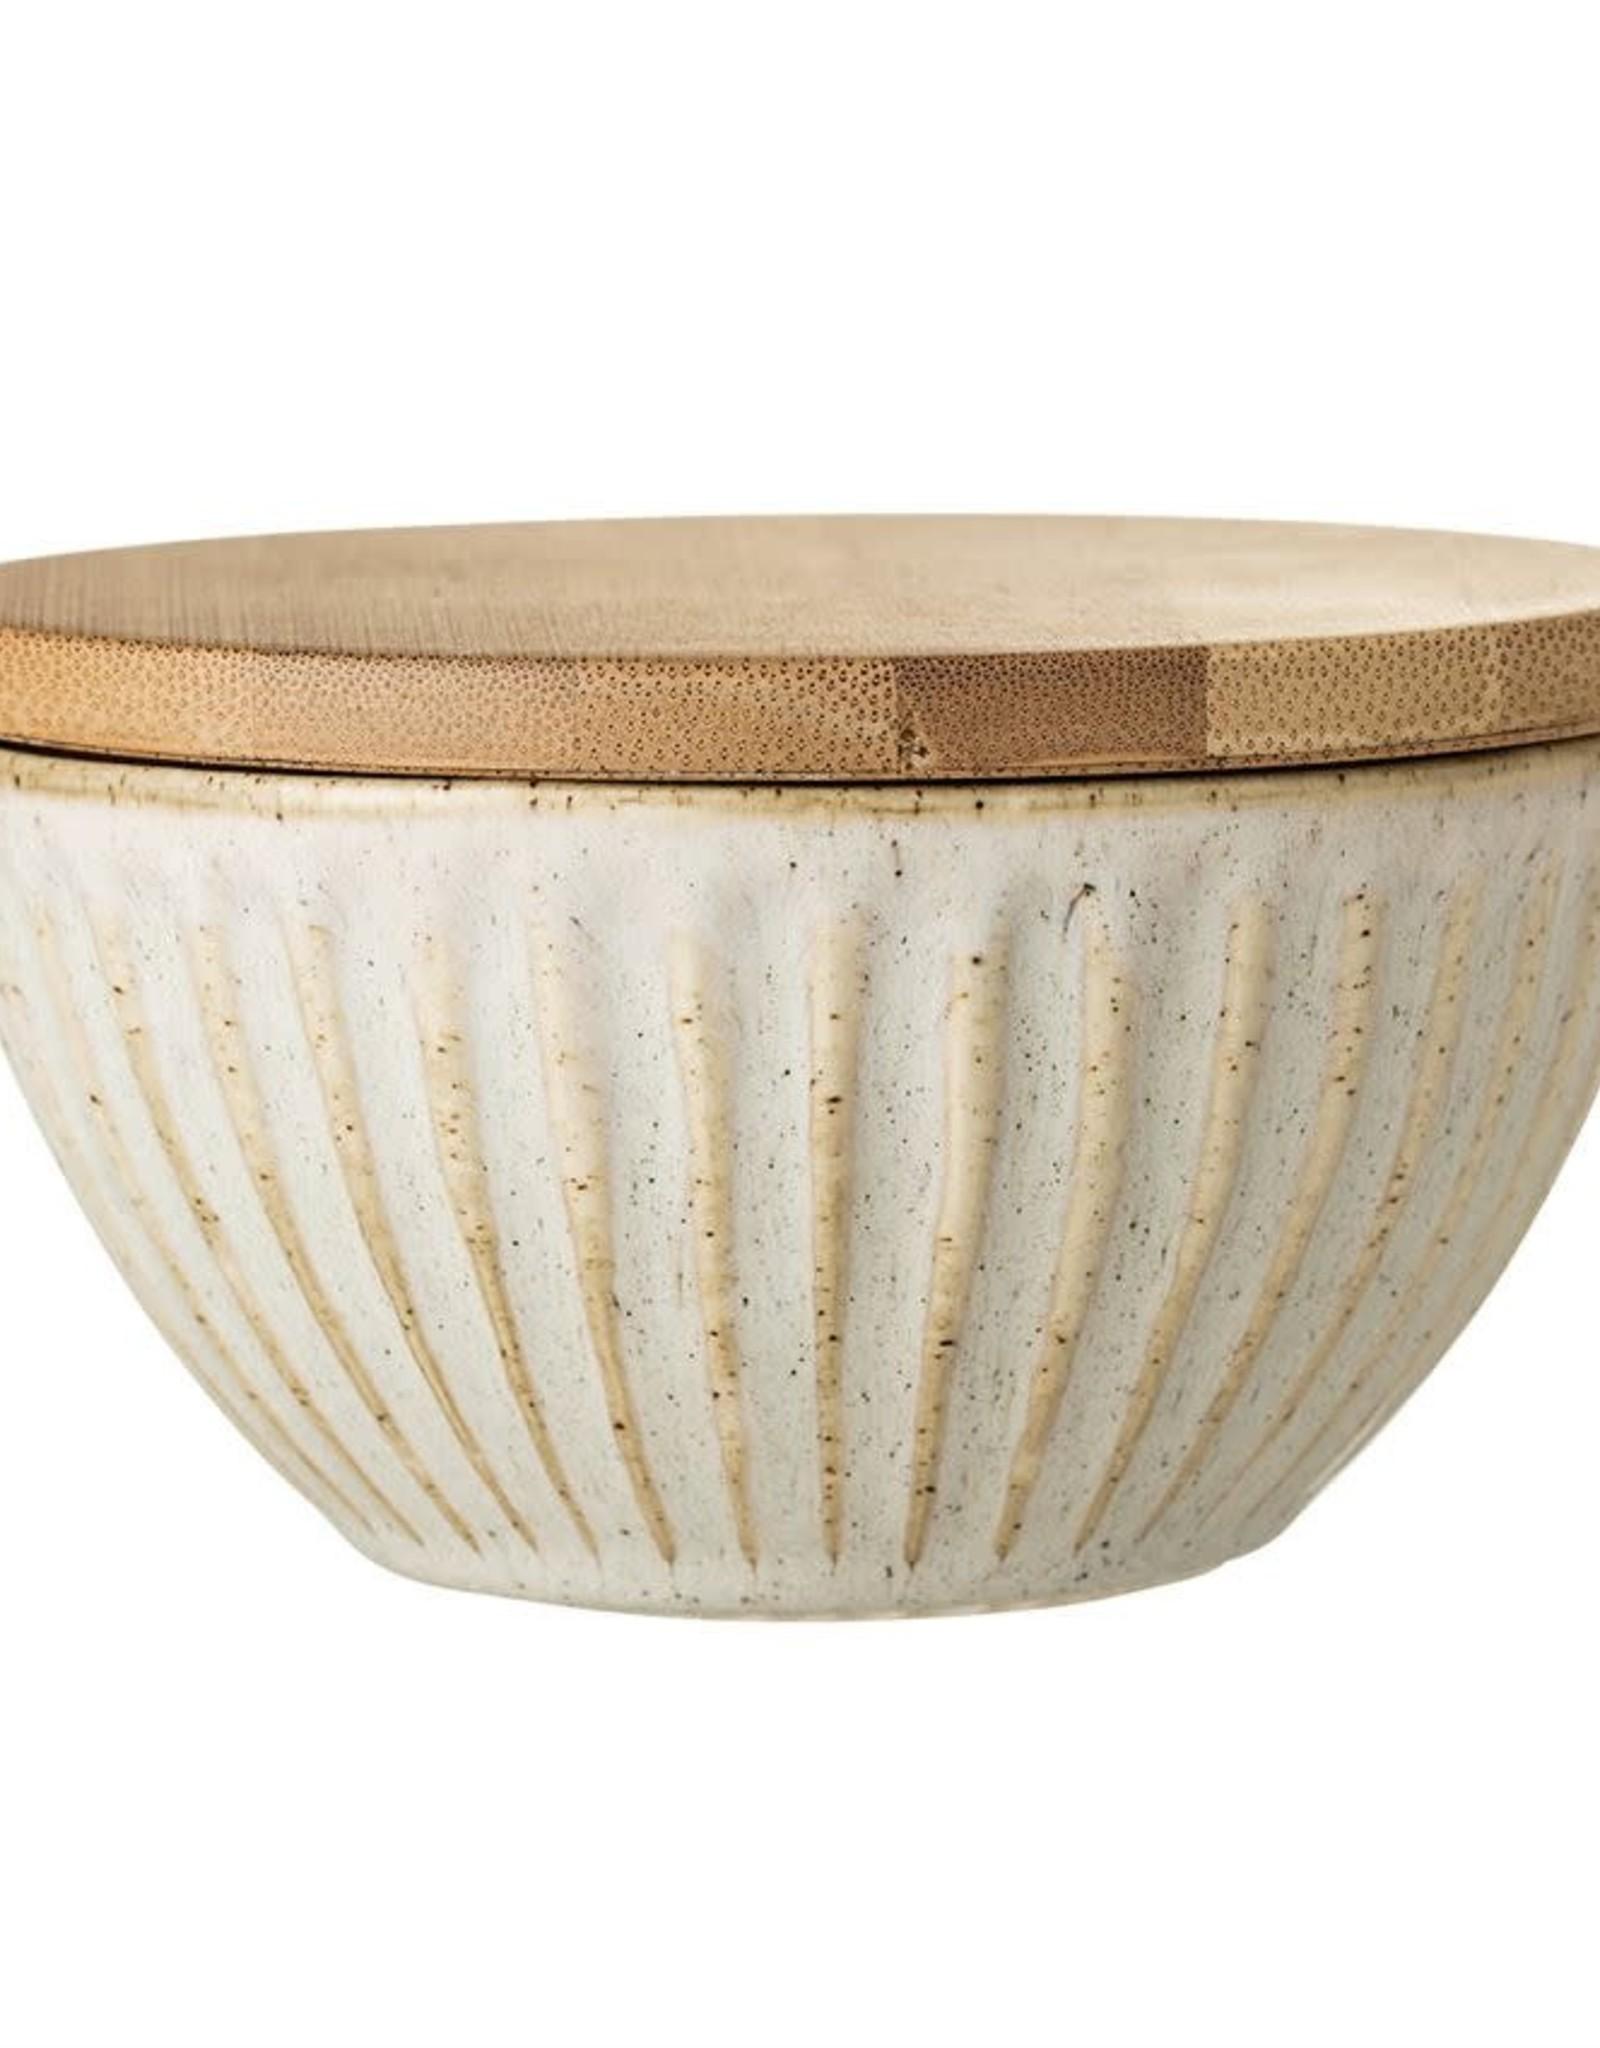 Bol en Grès avec Couvercle Bambou - Crème